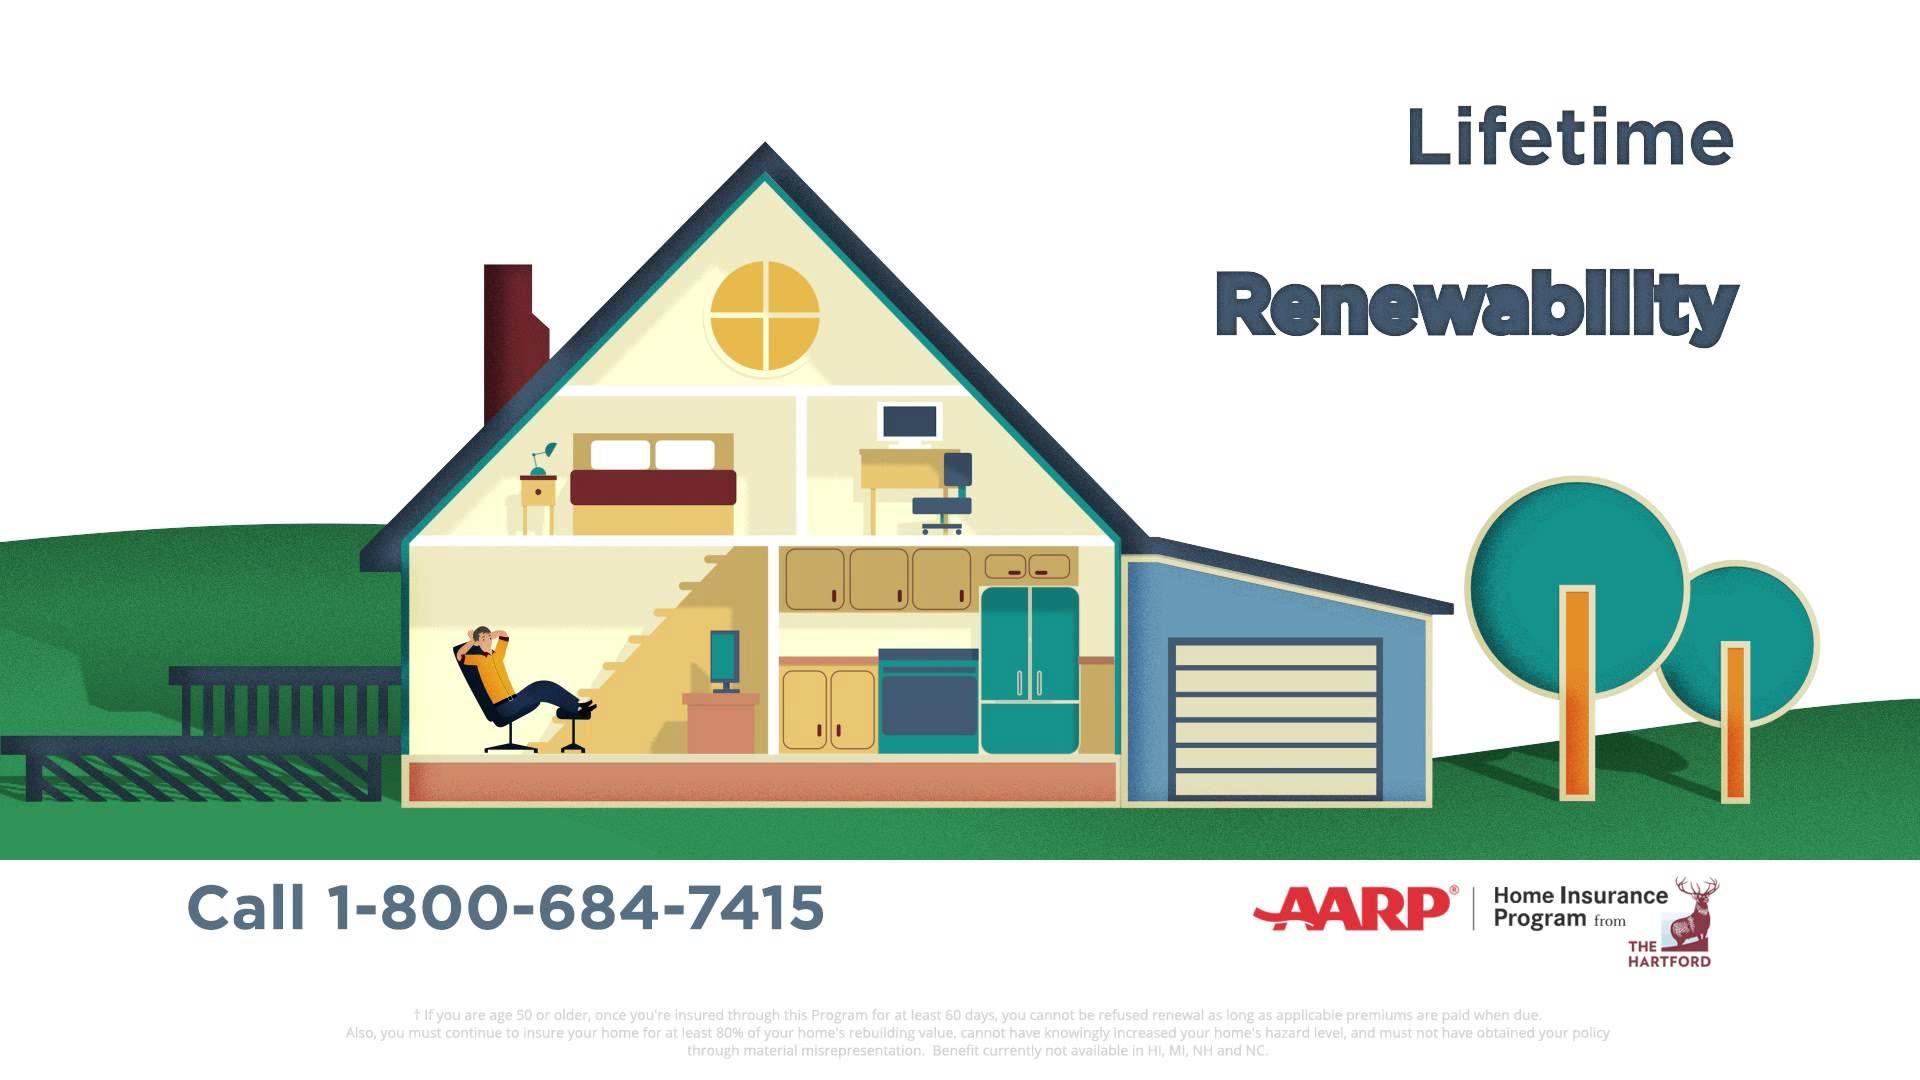 AARP Home Insurance